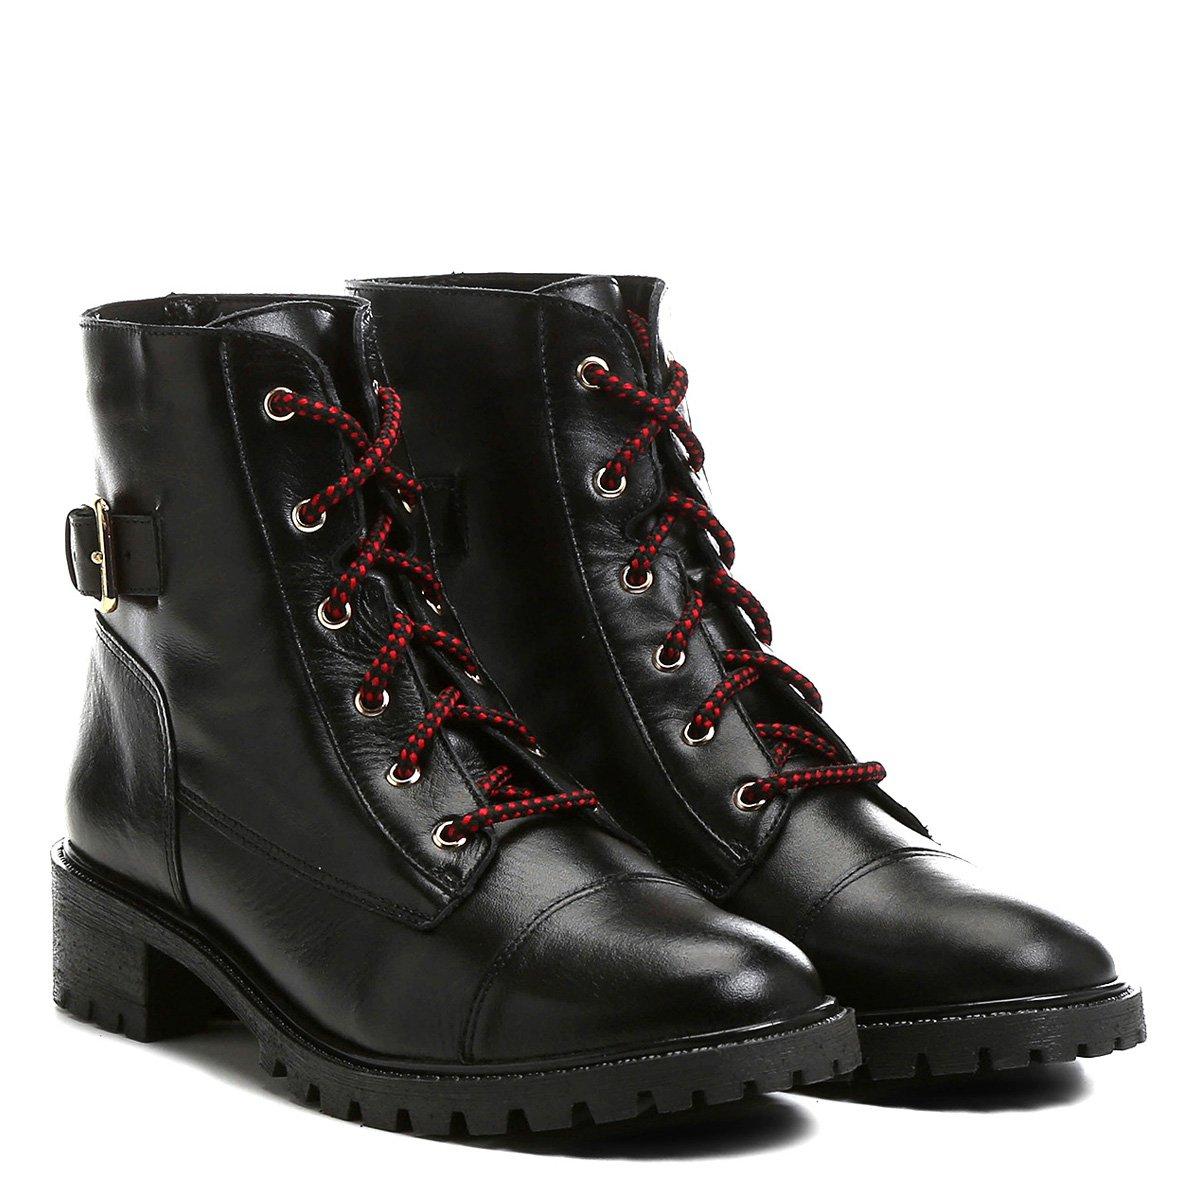 ff7594909 Bota Couro Coturno Shoestock Fivela Feminina | Shoestock